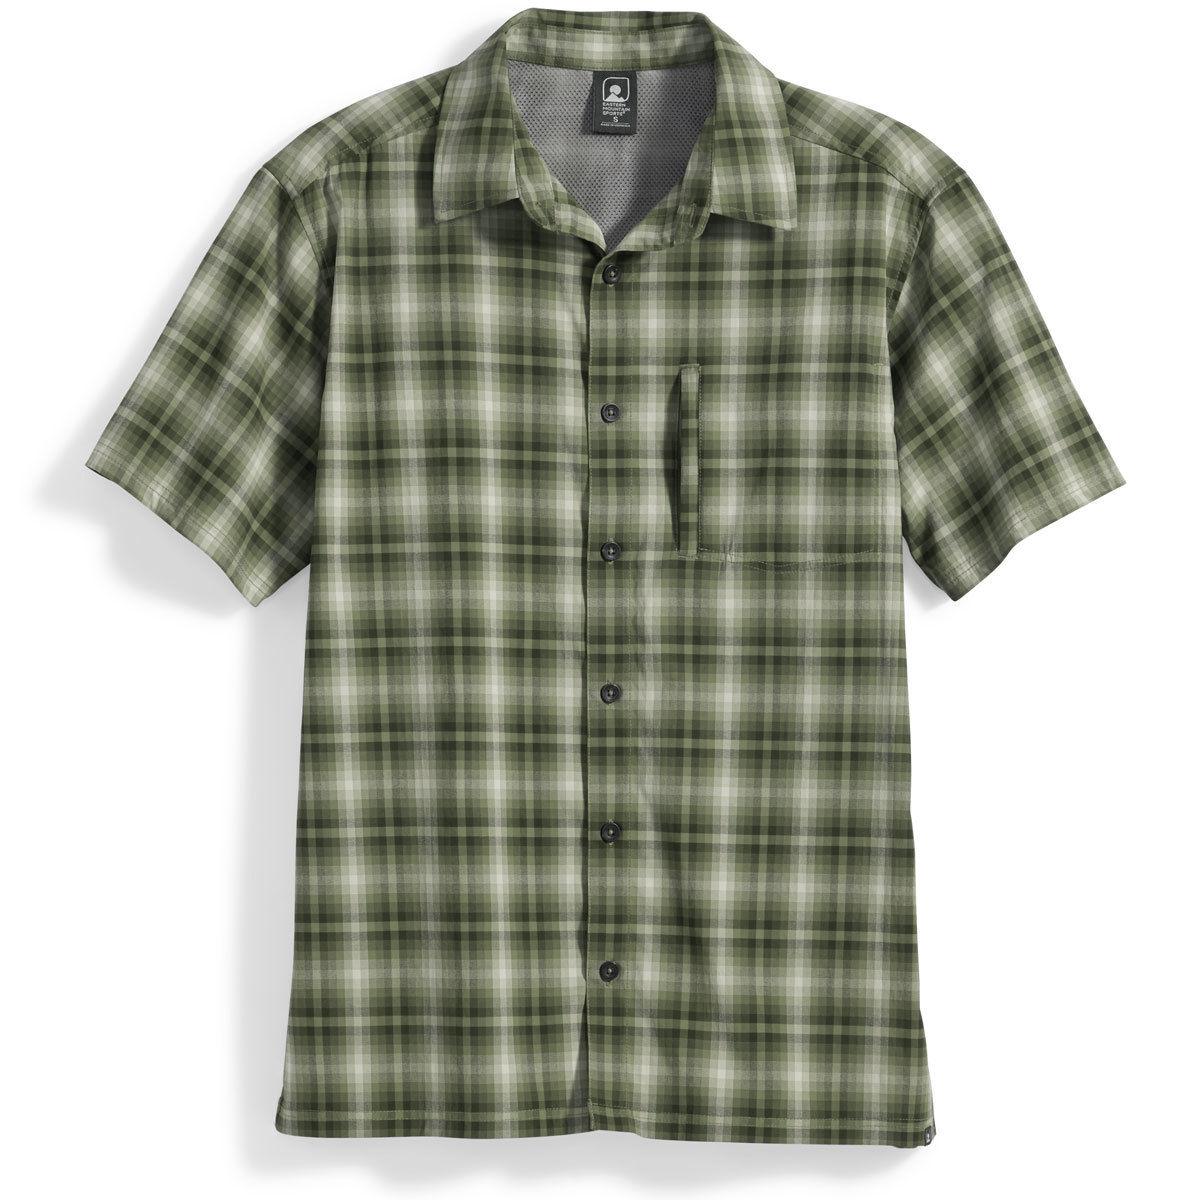 Ems Men's Journey Plaid Short-Sleeve Shirt - Green, M